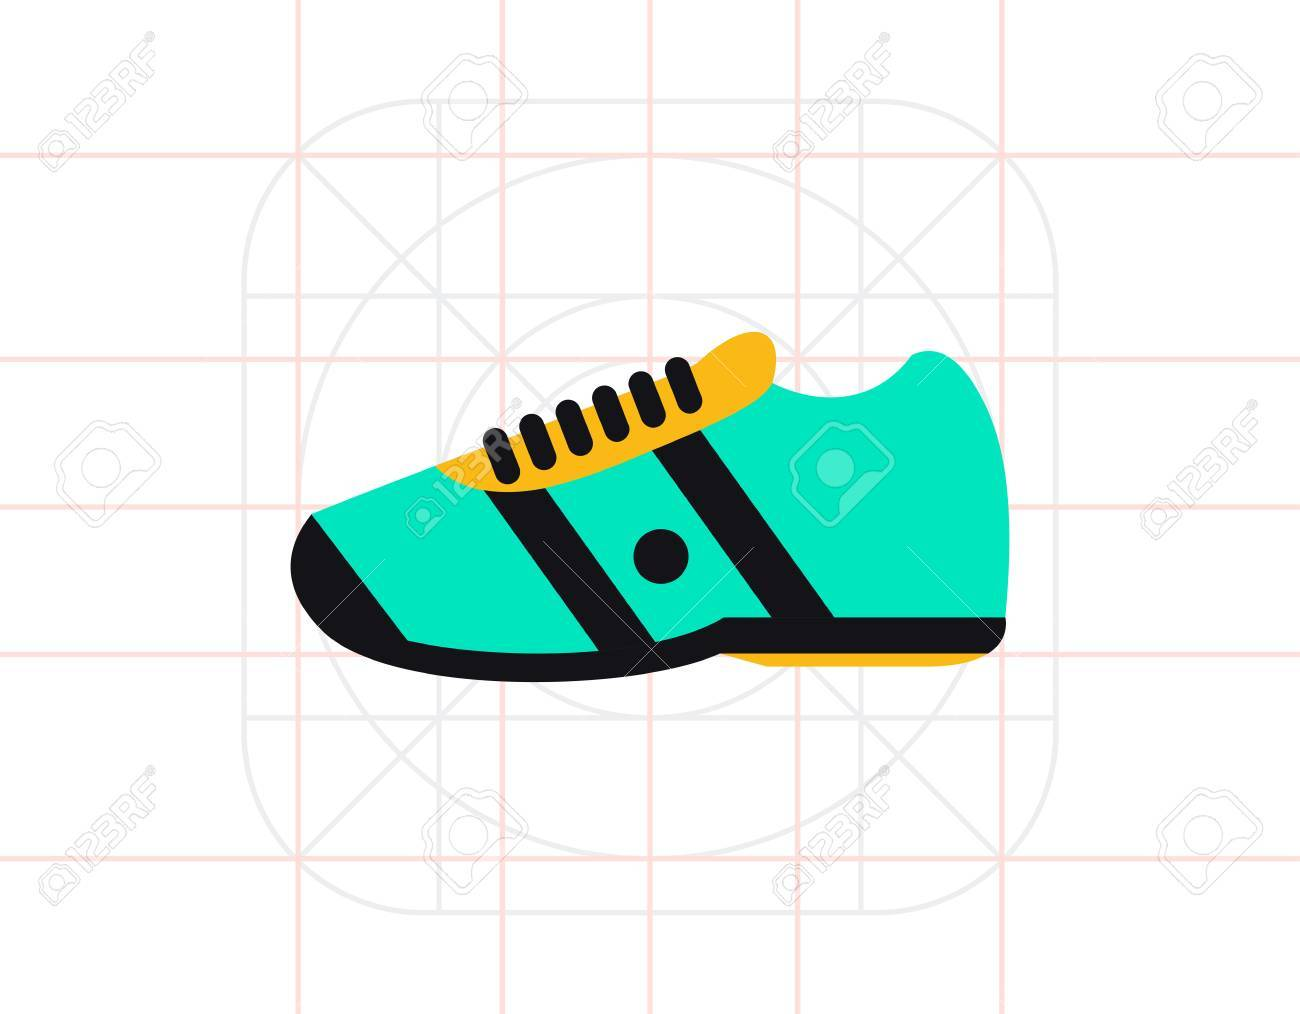 Scarpe Calcio Adidas Ace 17.1 PrimeKnit FG Blue Blast Pack